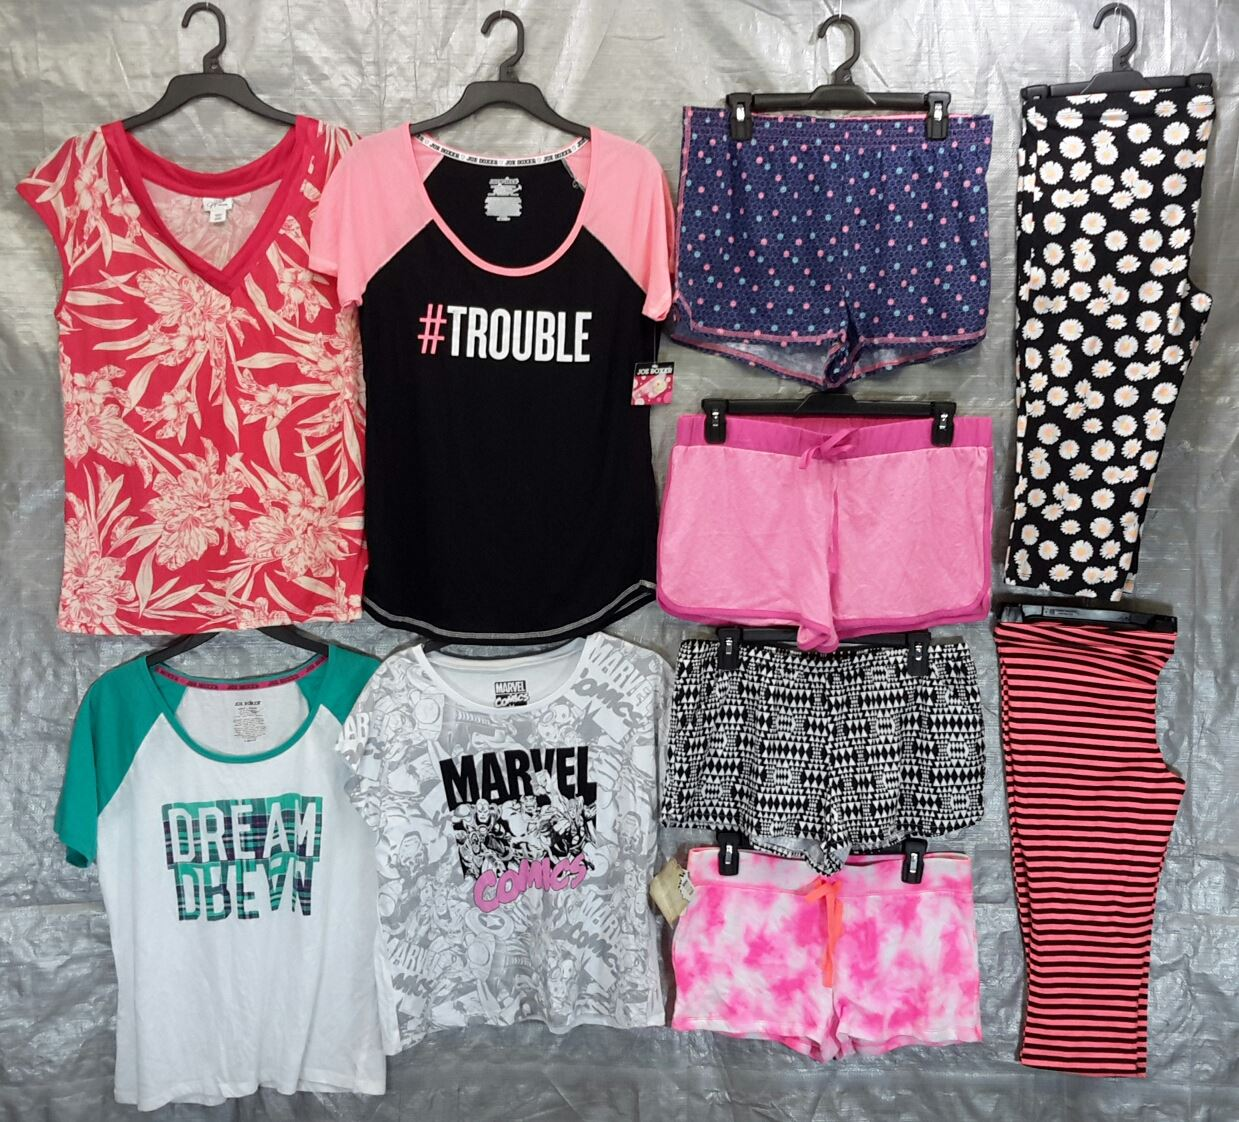 Wholesale Lot of 100 Assorted Sleep Tops bottoms PAJAMAS Sleepwear Womens Mixed Sizes